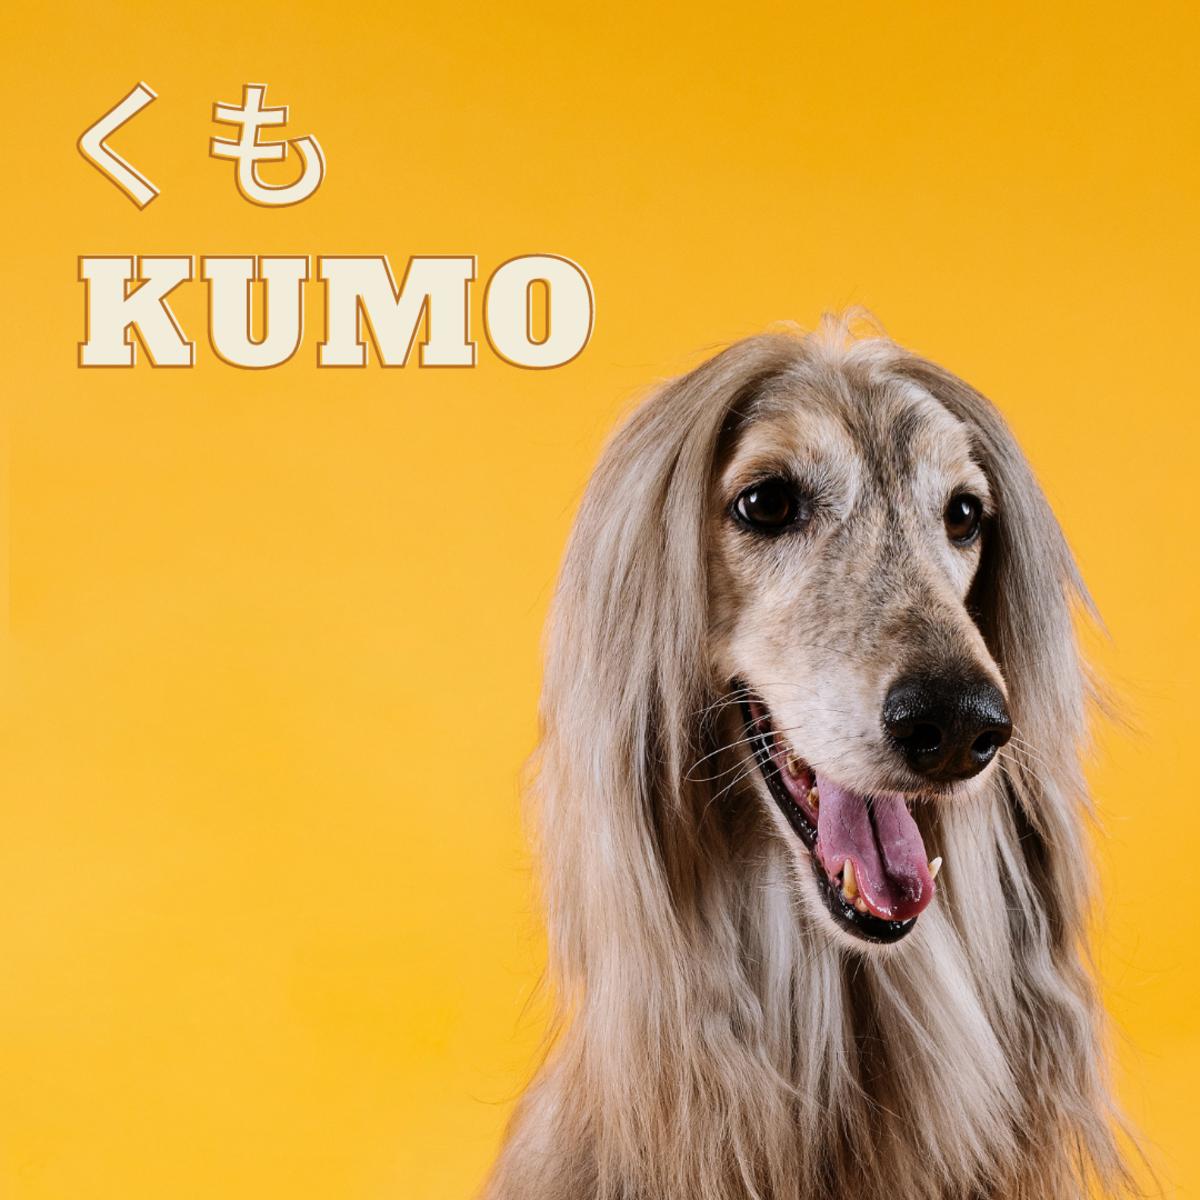 Kumo or Cloud